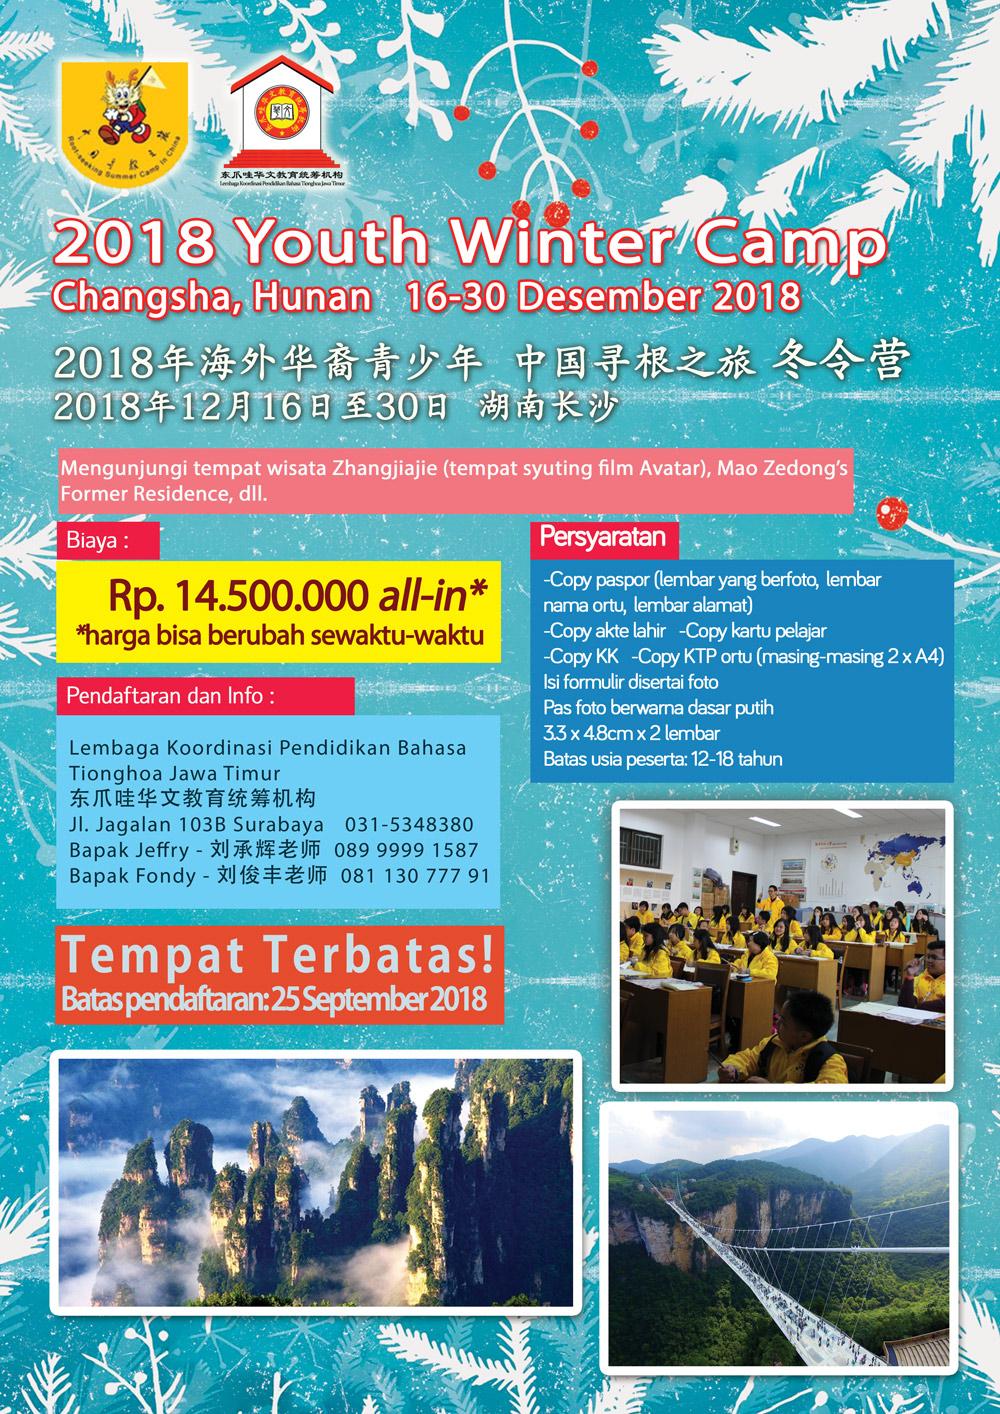 Winter Camp Changsha 2018